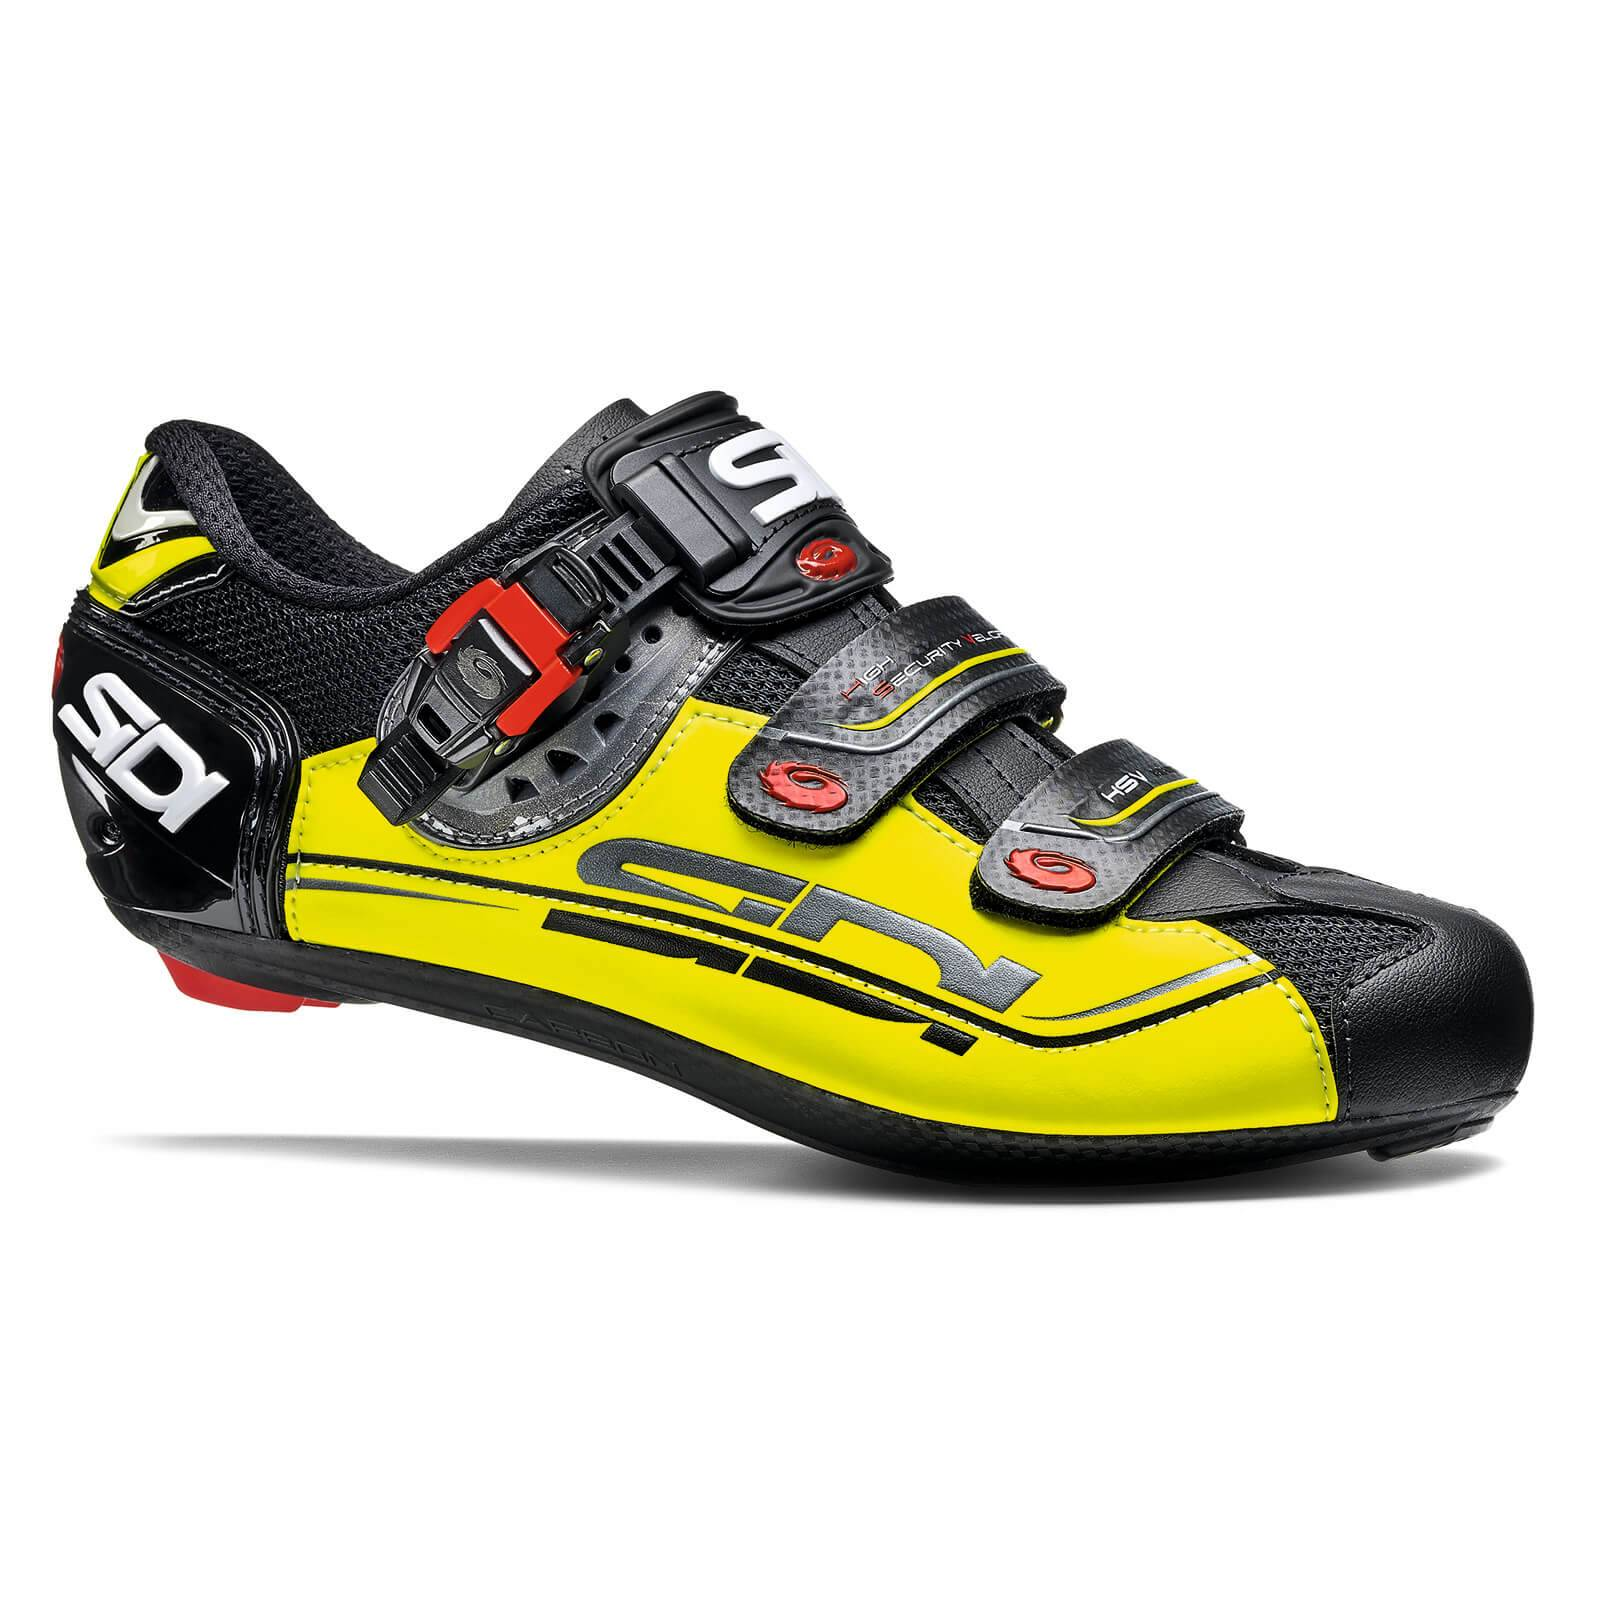 Sidi Genius 7 Mega Road Shoes - Black/Yellow Fluo/Black - EU 43 - Black/Yellow Fluo/Black